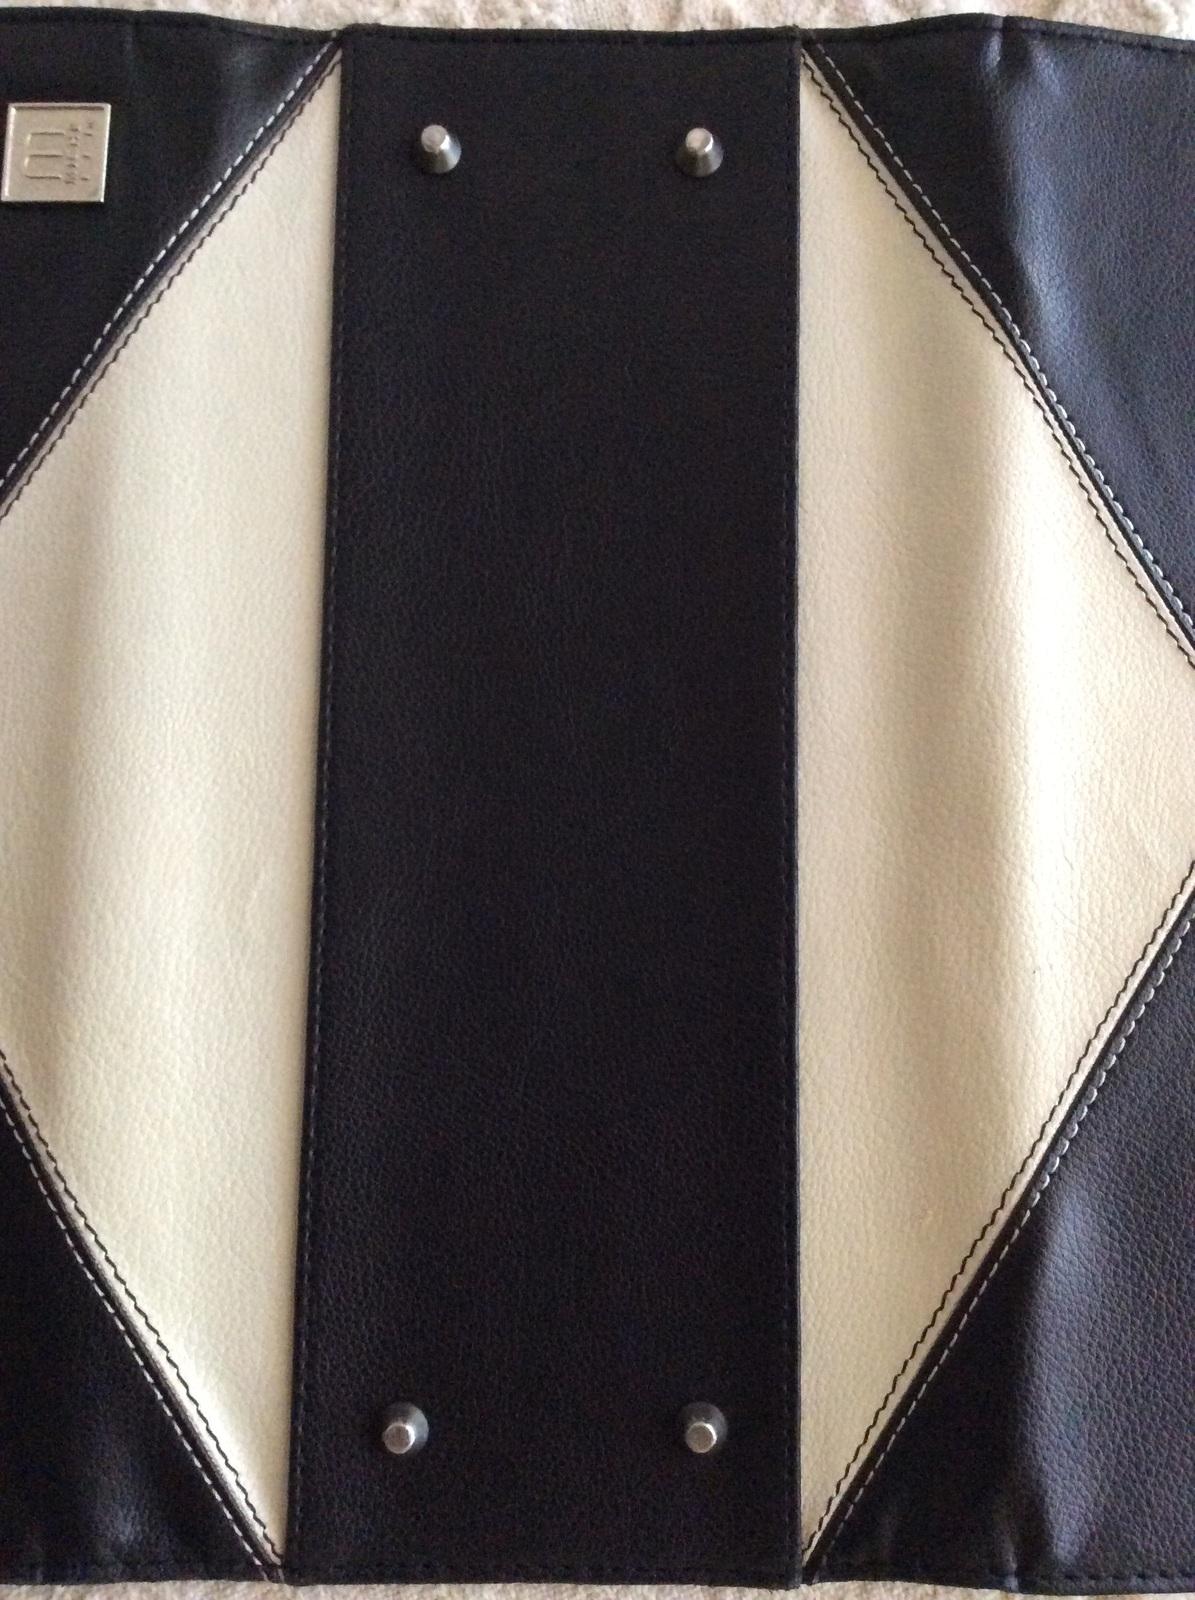 Miche Classic Shell Kenzie Black and White Large Diamond pattern